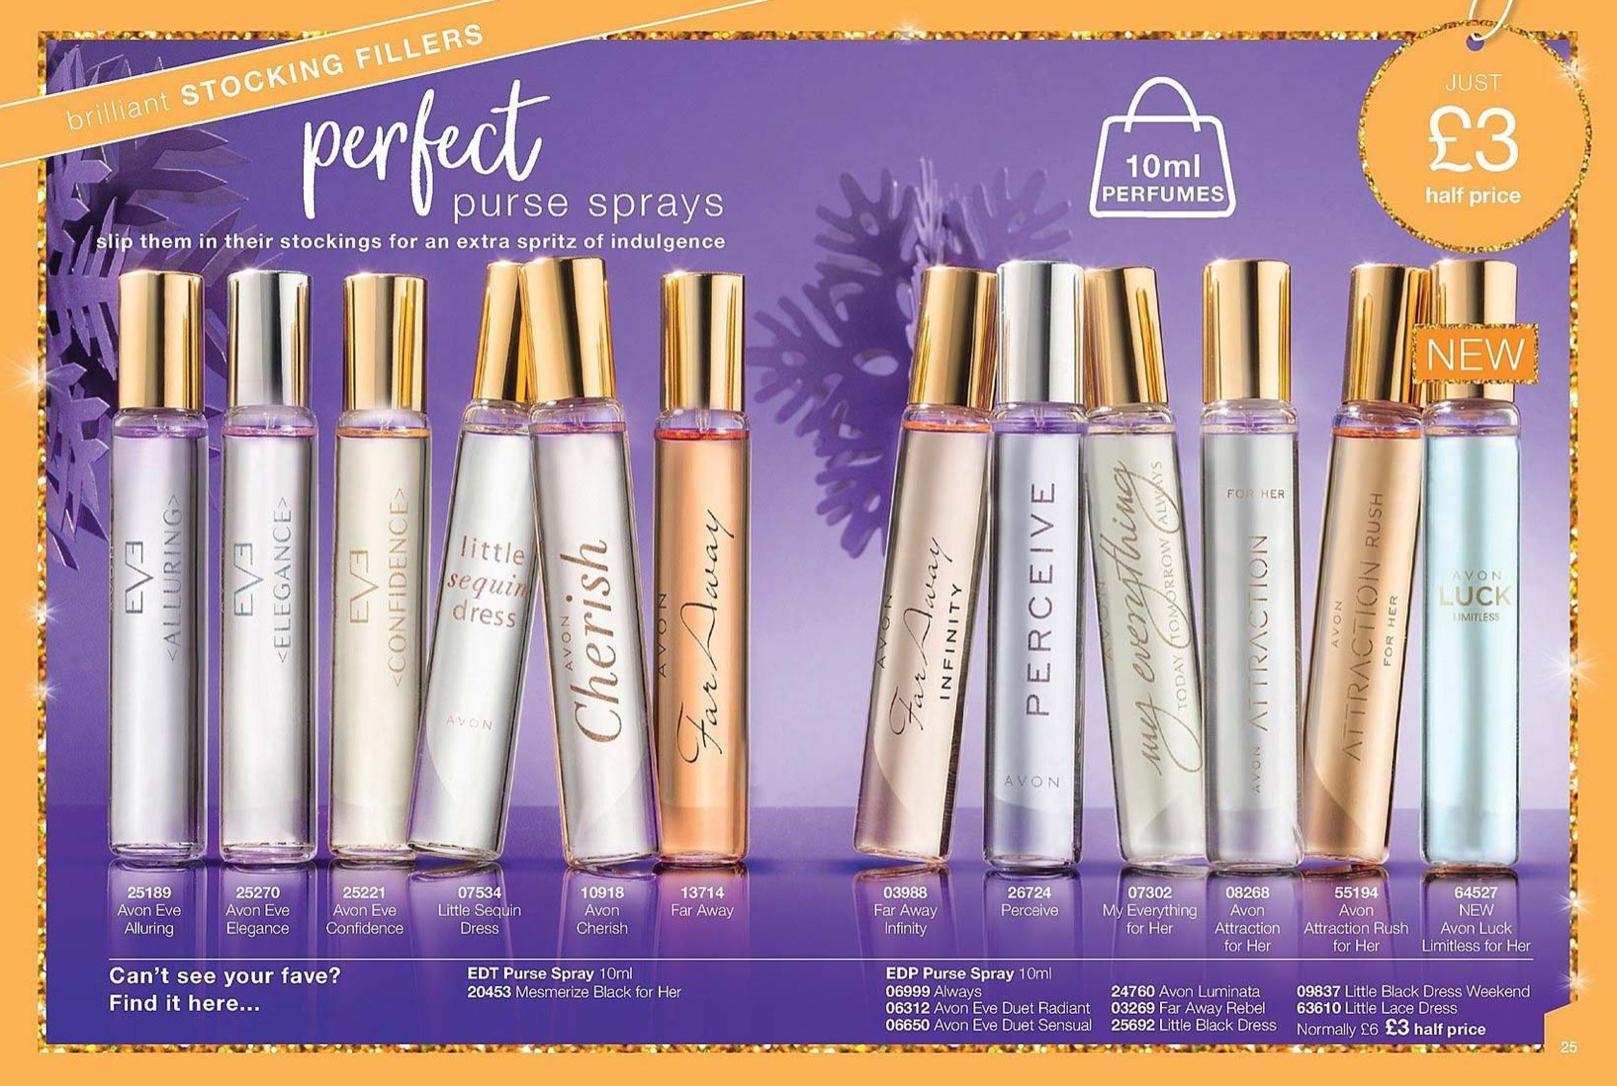 Avon UK Brochure 1 2019 Perfume and Fragrances